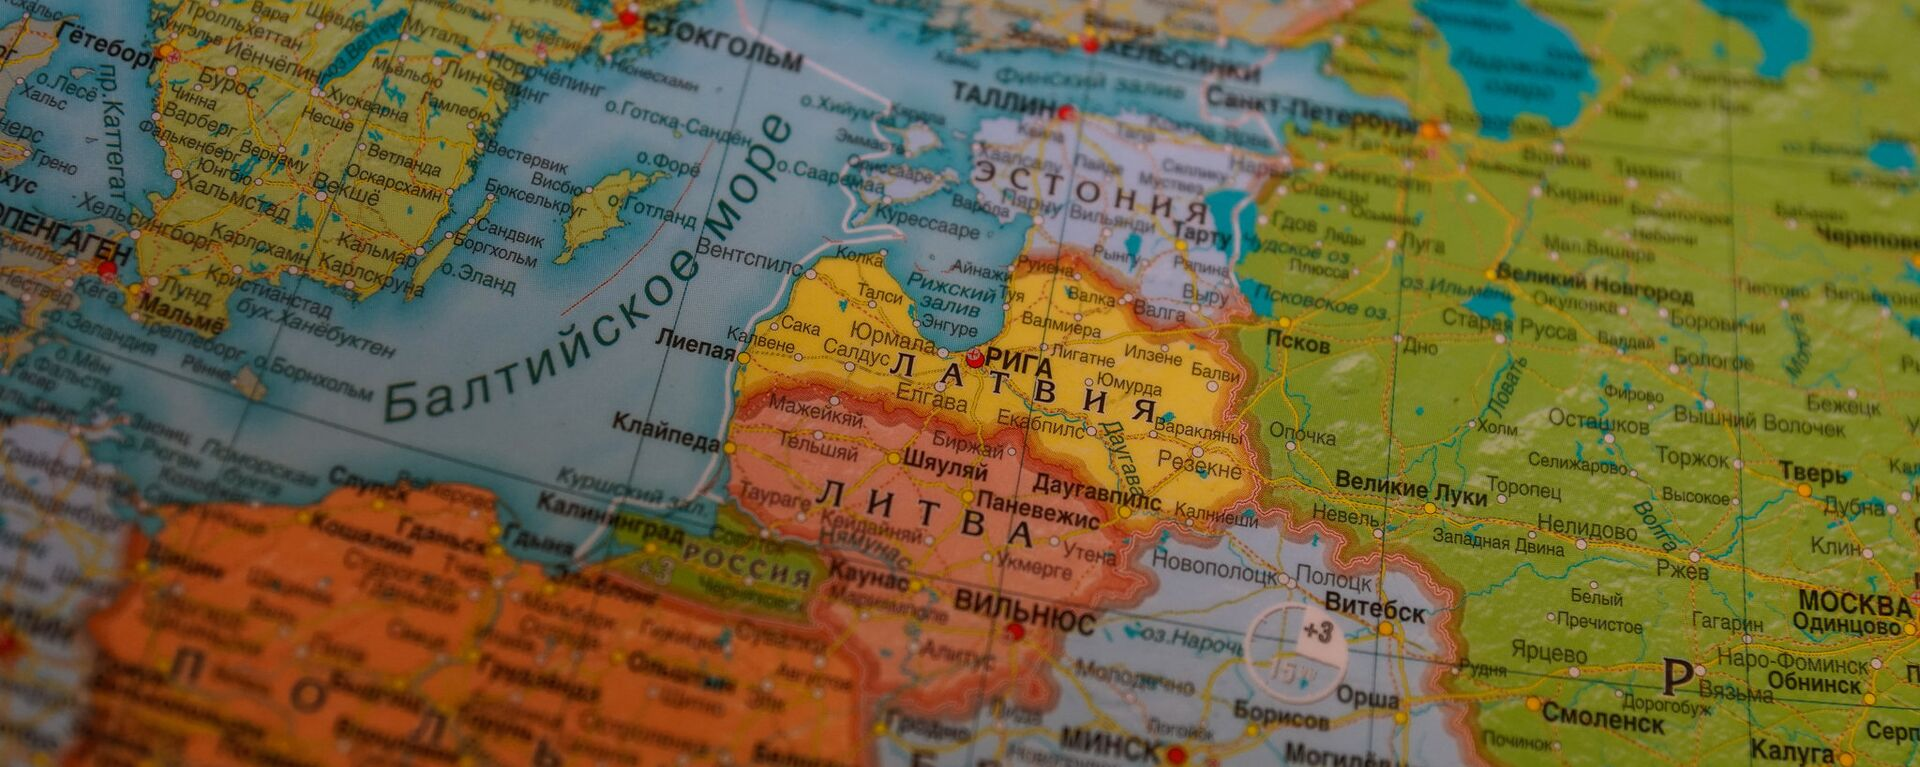 Прибалтика на карте Европы - Sputnik Латвия, 1920, 02.02.2018